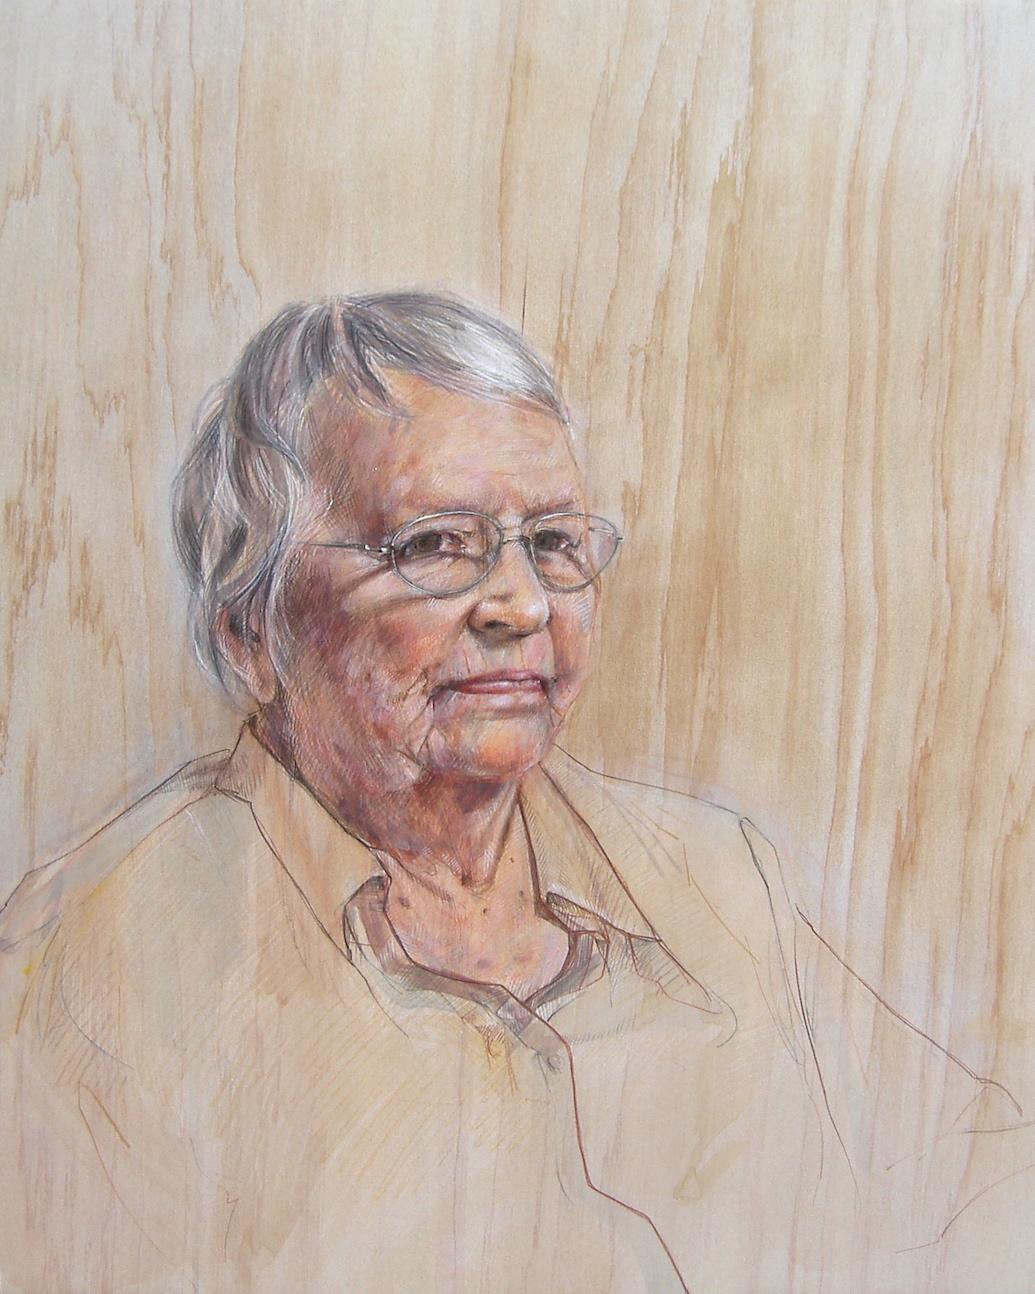 Mike's grandma